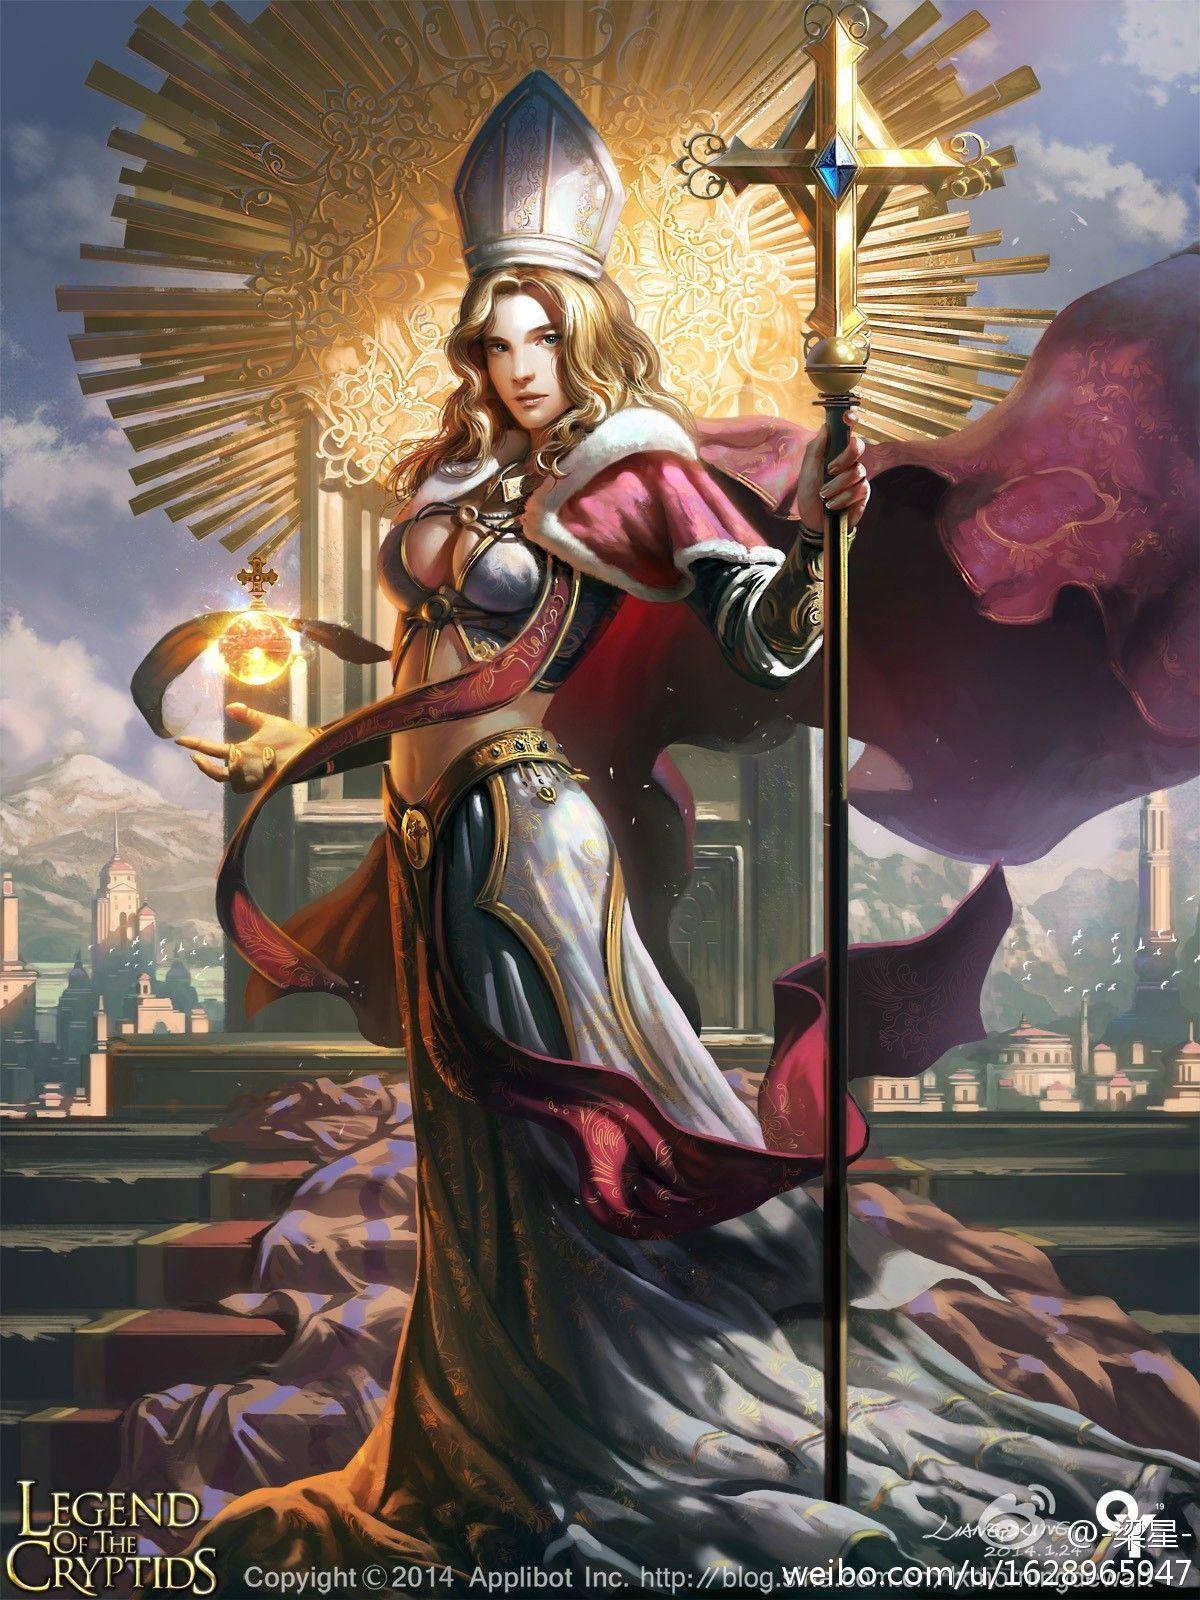 Artist: Liang Xing aka lxmorningdewart - Title: revered oracle milleon - Card: Revered Oracle Milleon